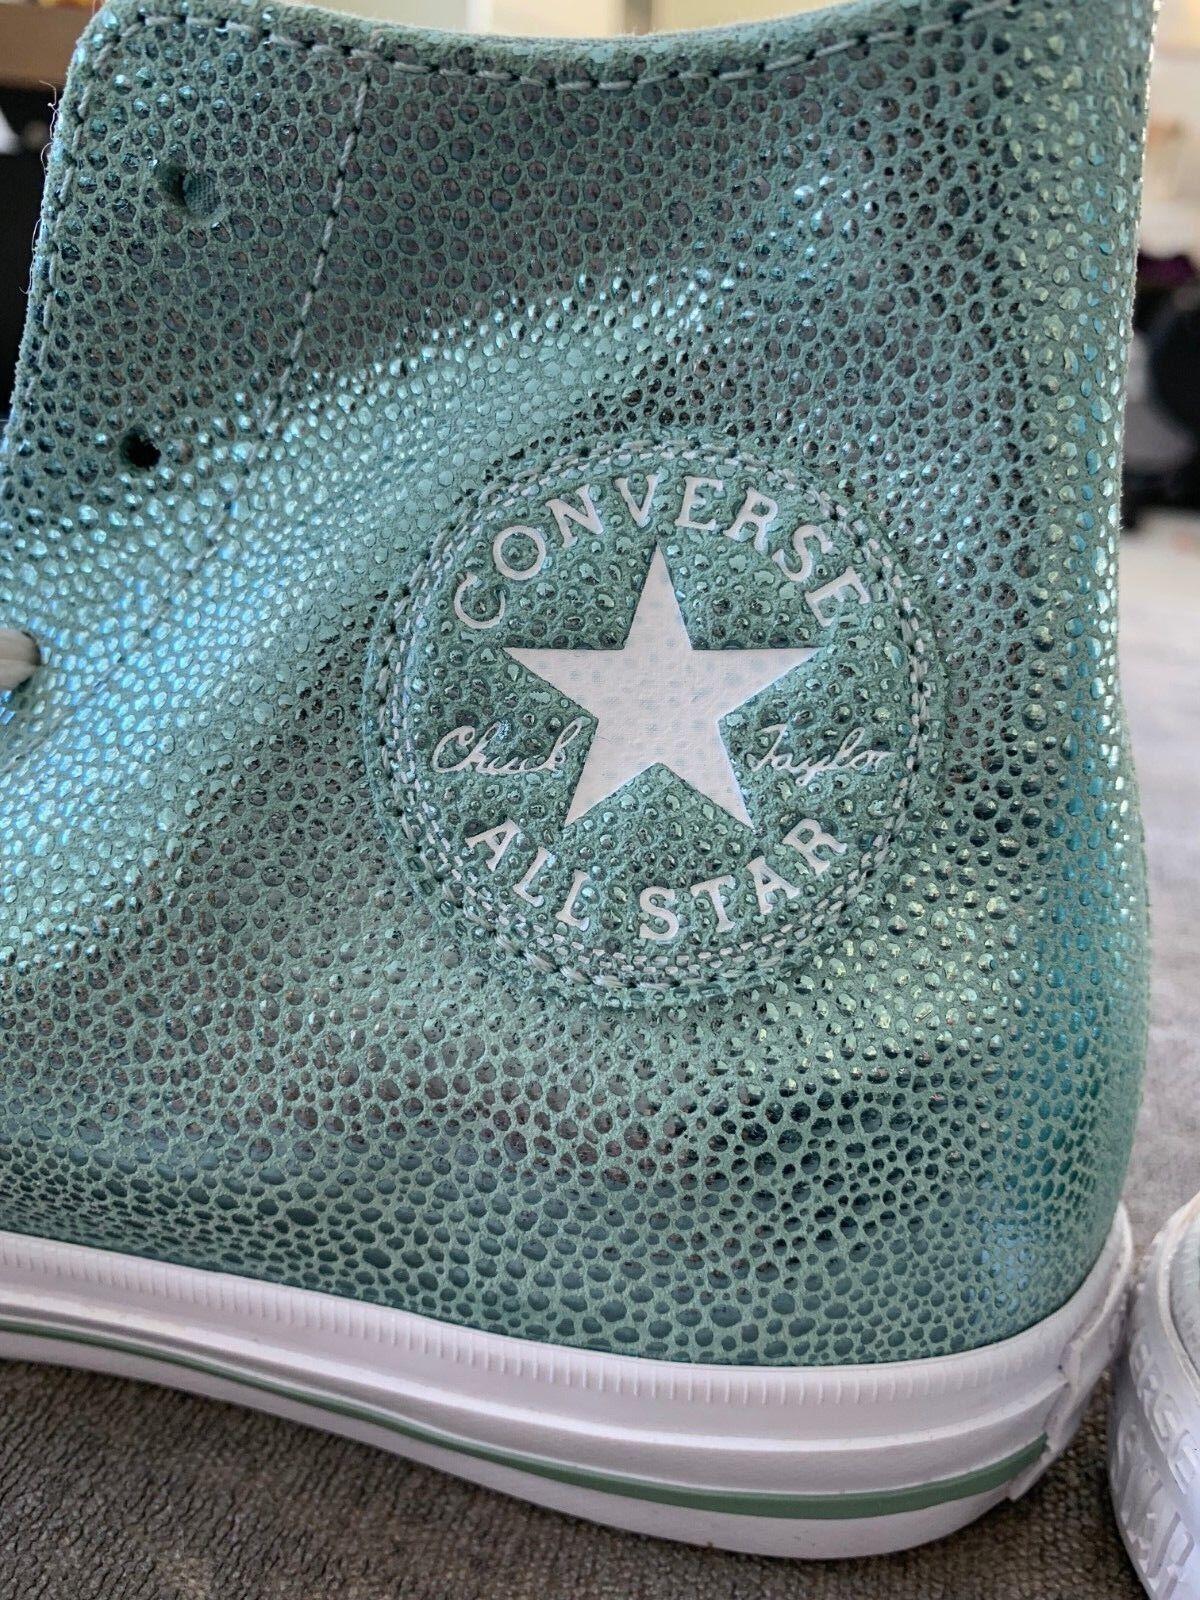 CONVERSE Chuck Taylor All Star Gemma Sting Ray Leder (retail ) ) (retail 63d984